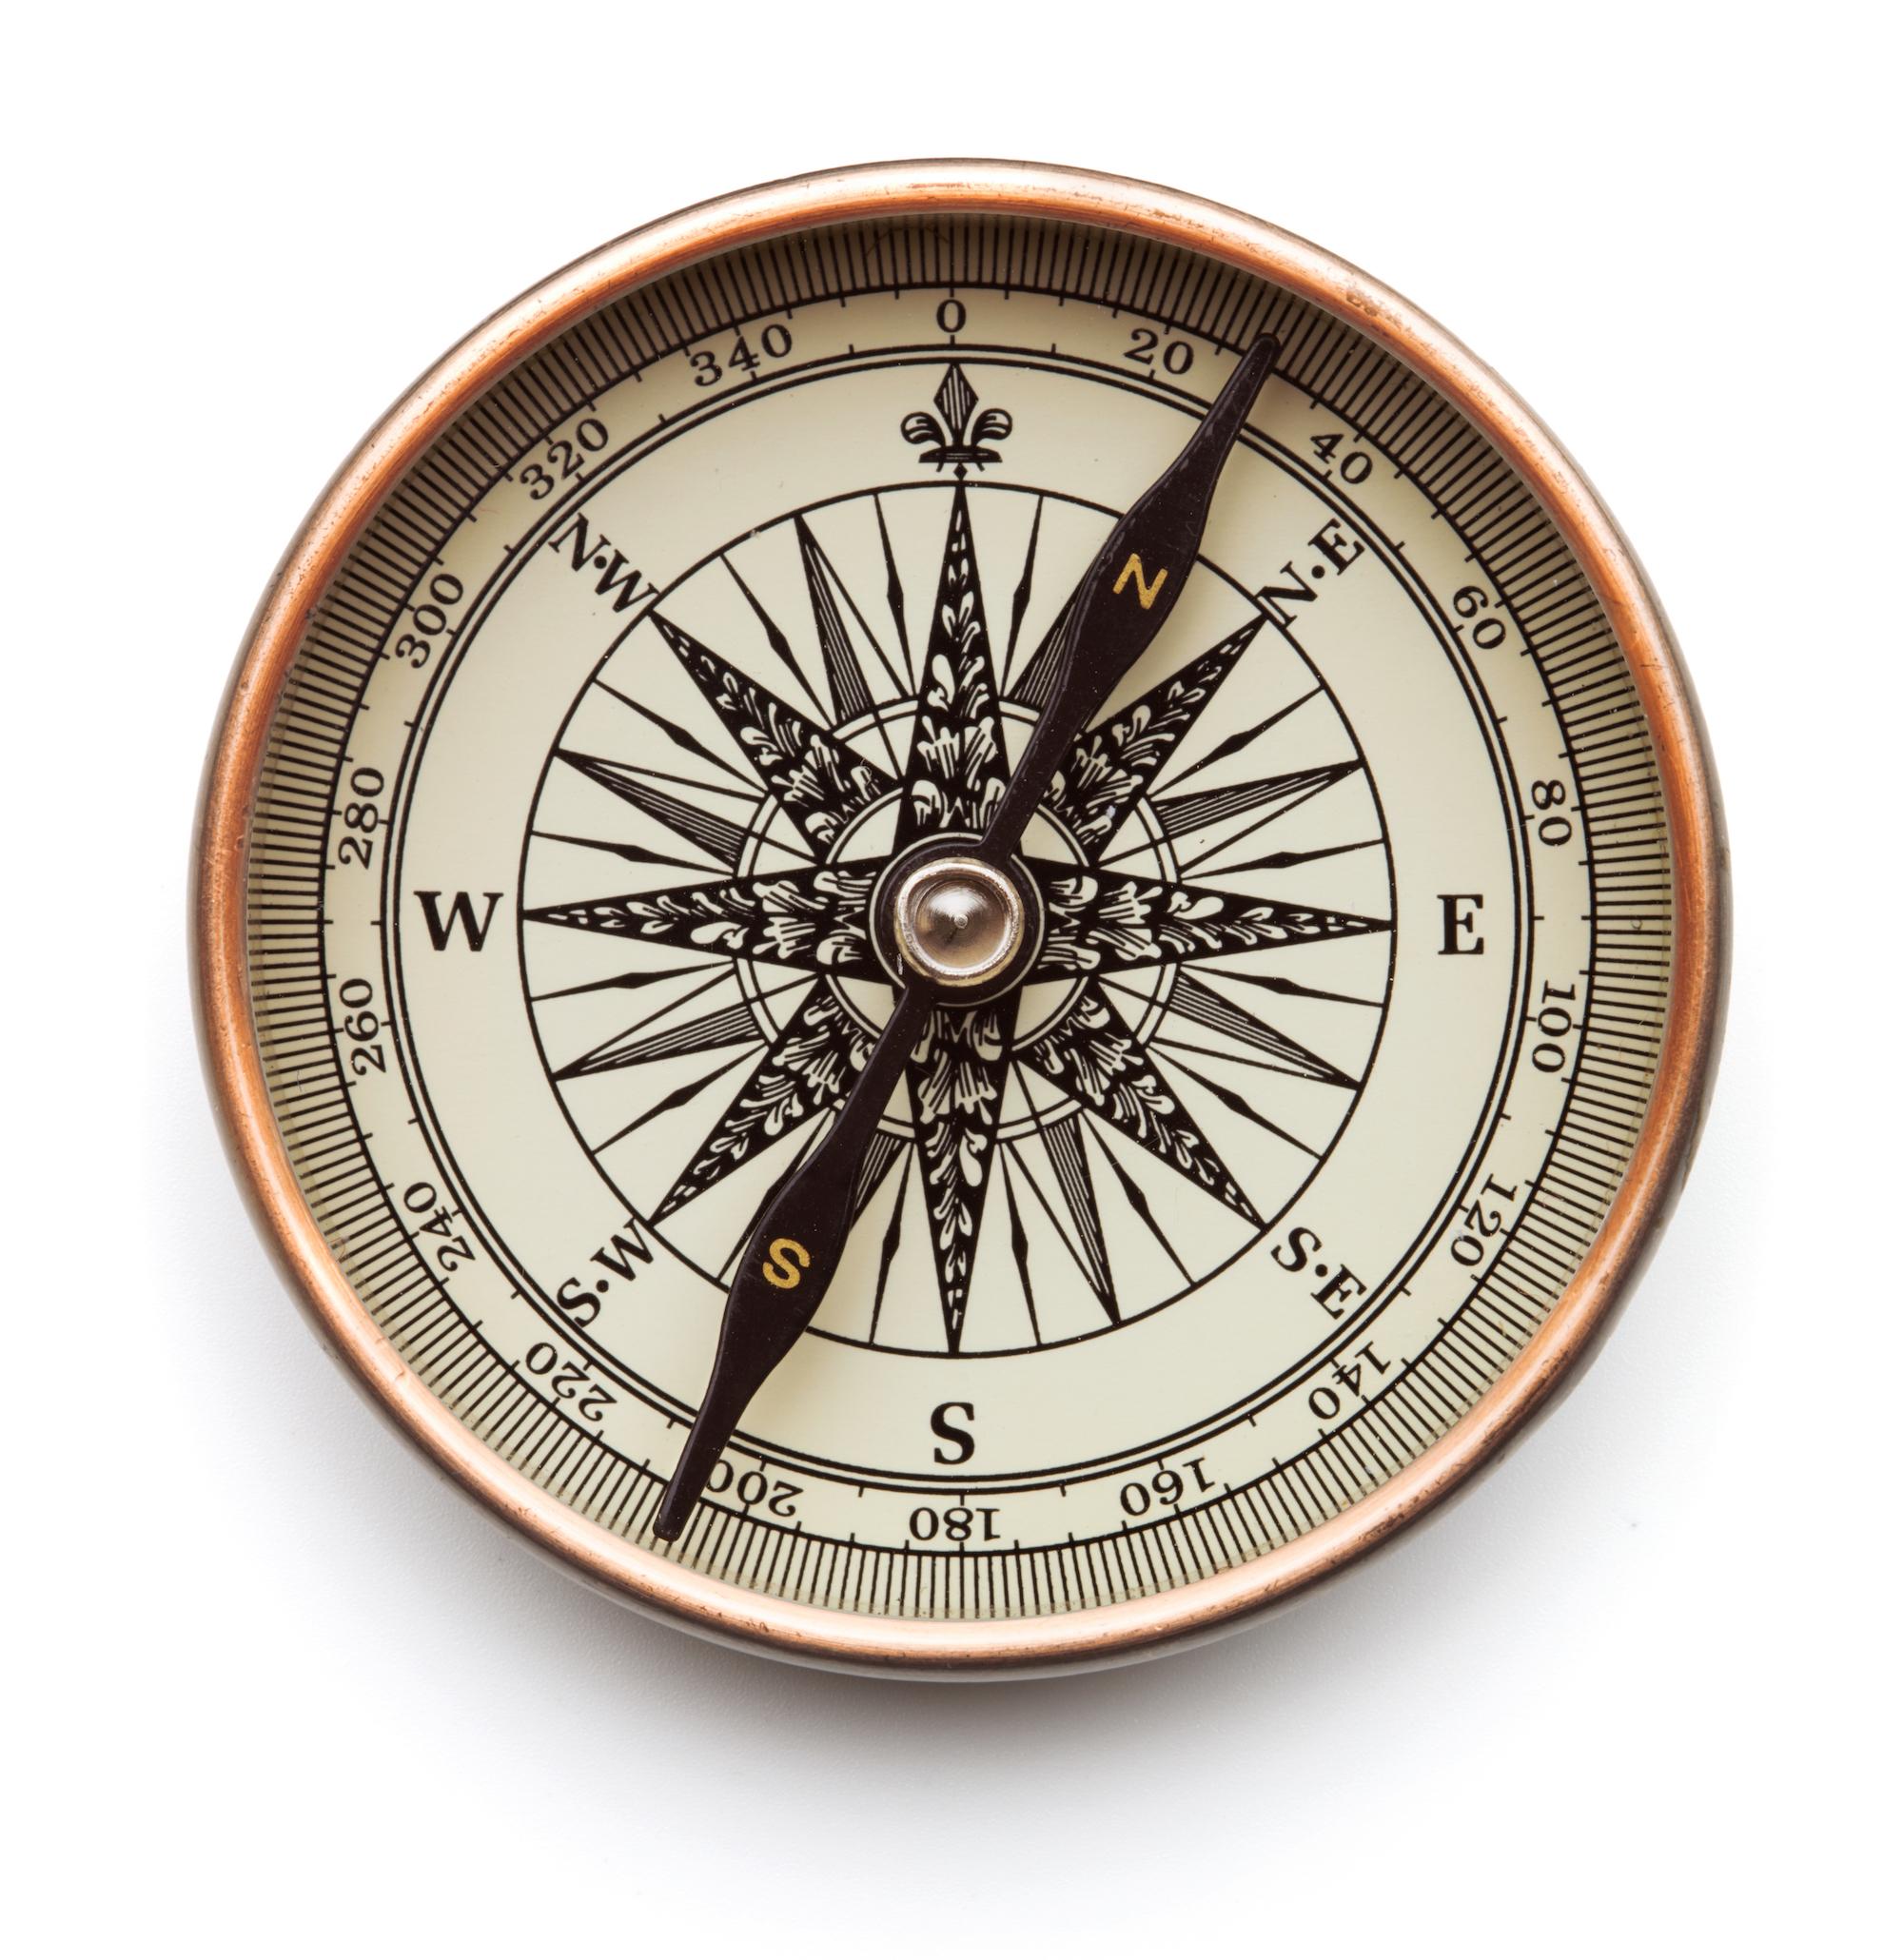 map&compass_chris-lawton-217429 2.jpg